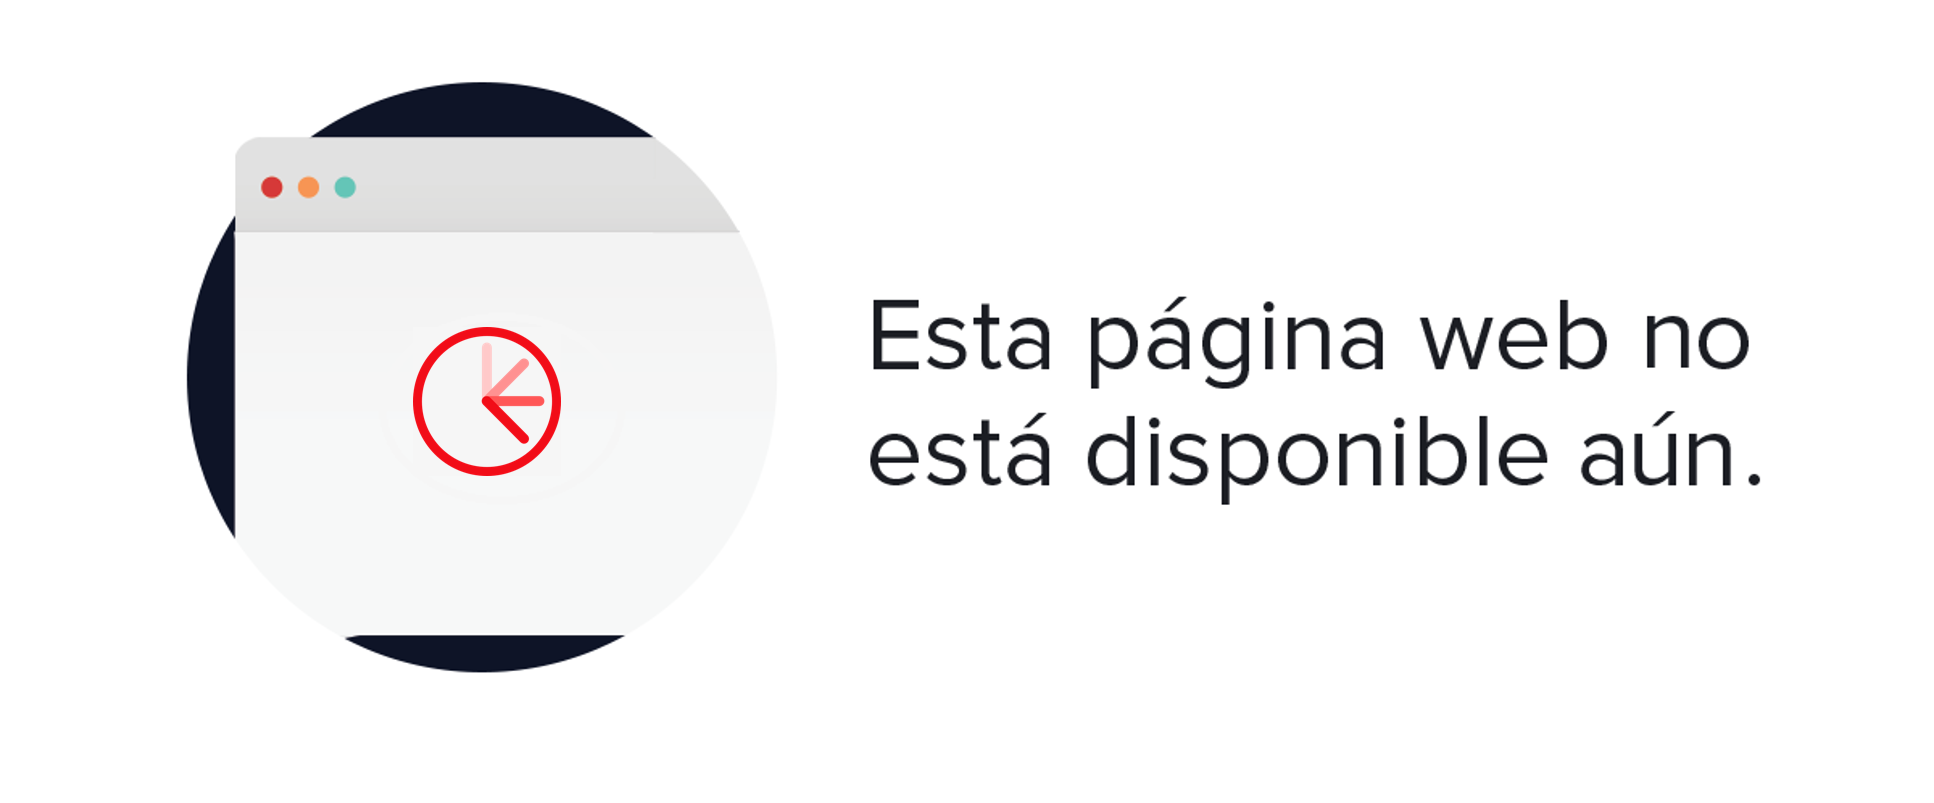 OXXO - Falda de mujer OXXO plisada con estampado plateado Negro 8681613006379 - DRSHRQT